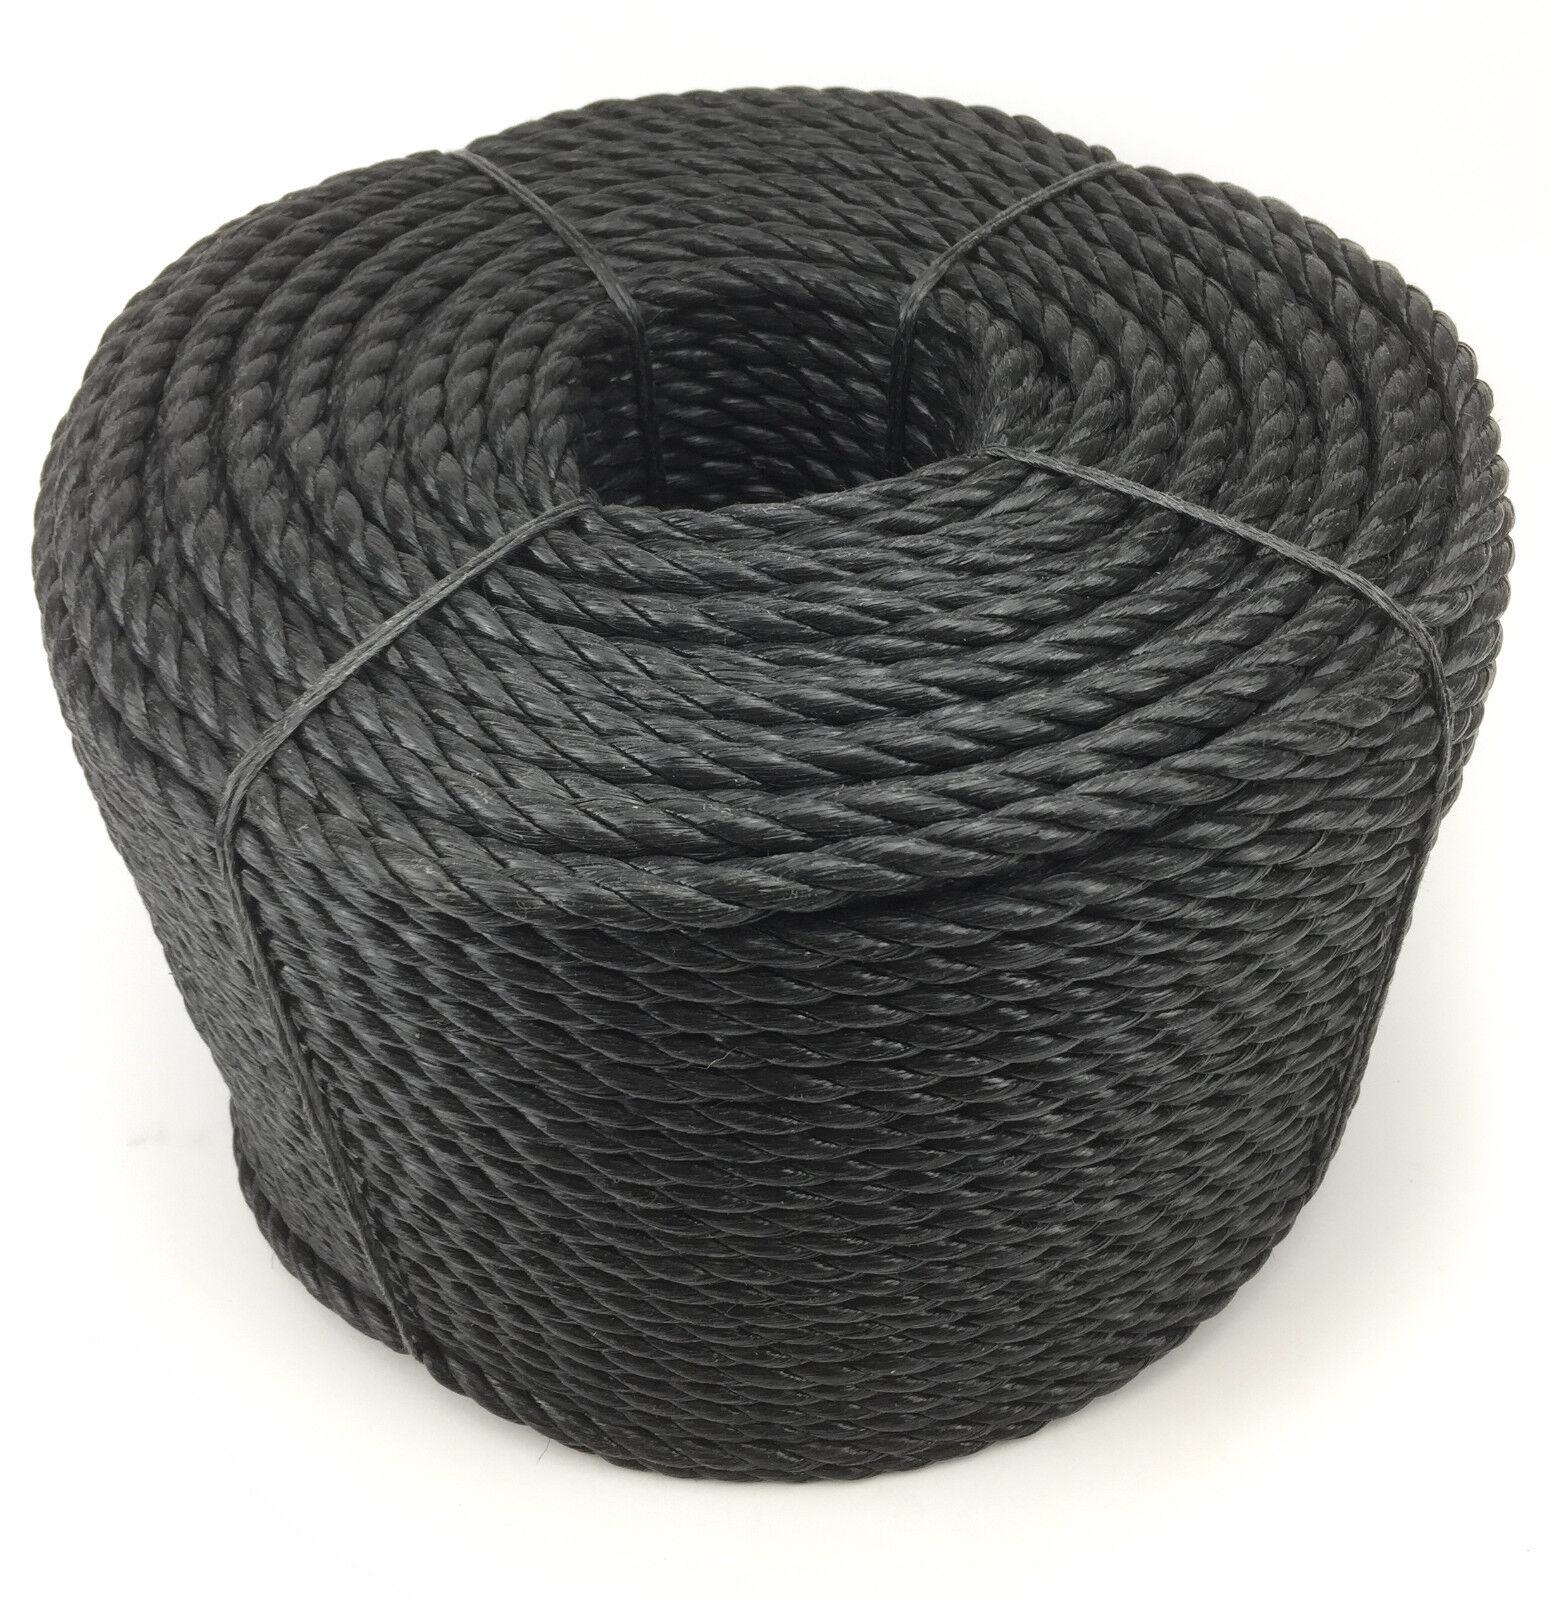 16mm schwarz Polypropylen Seil Meter, x 75 Meter, Seil Poly-Seil Rollen, preiswert Nylon f7282a